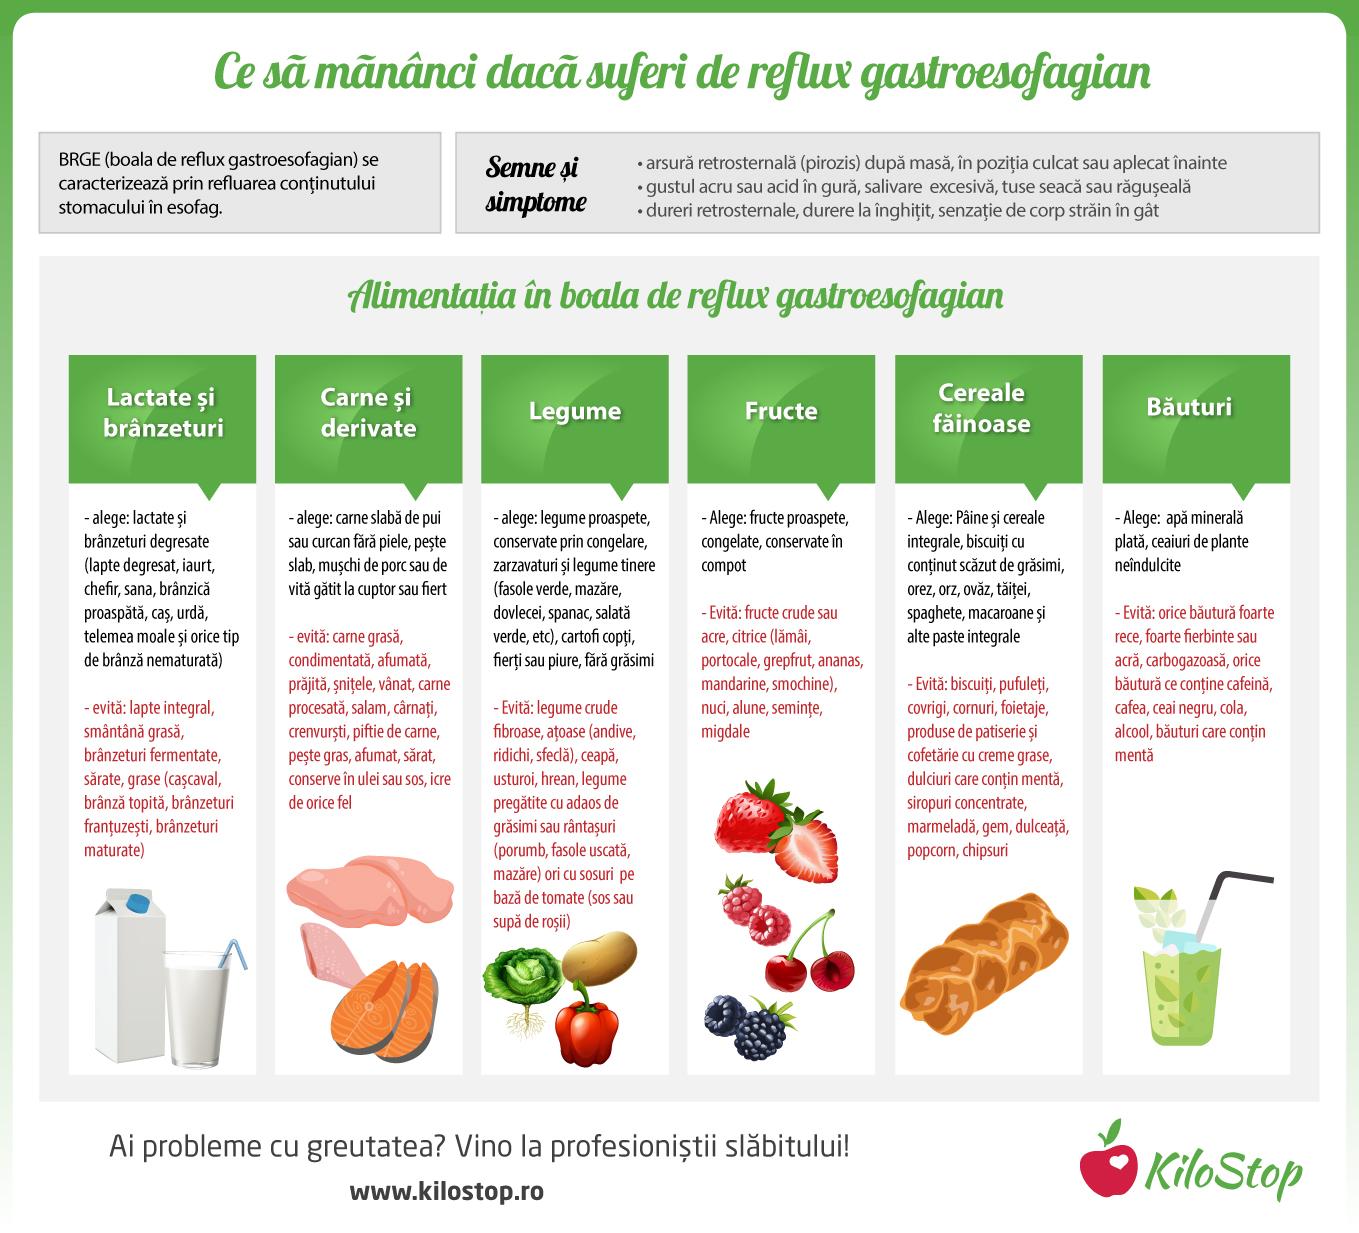 Alimente recomandate in artrita reumatoida - Farmacia Ta - Farmacia Ta